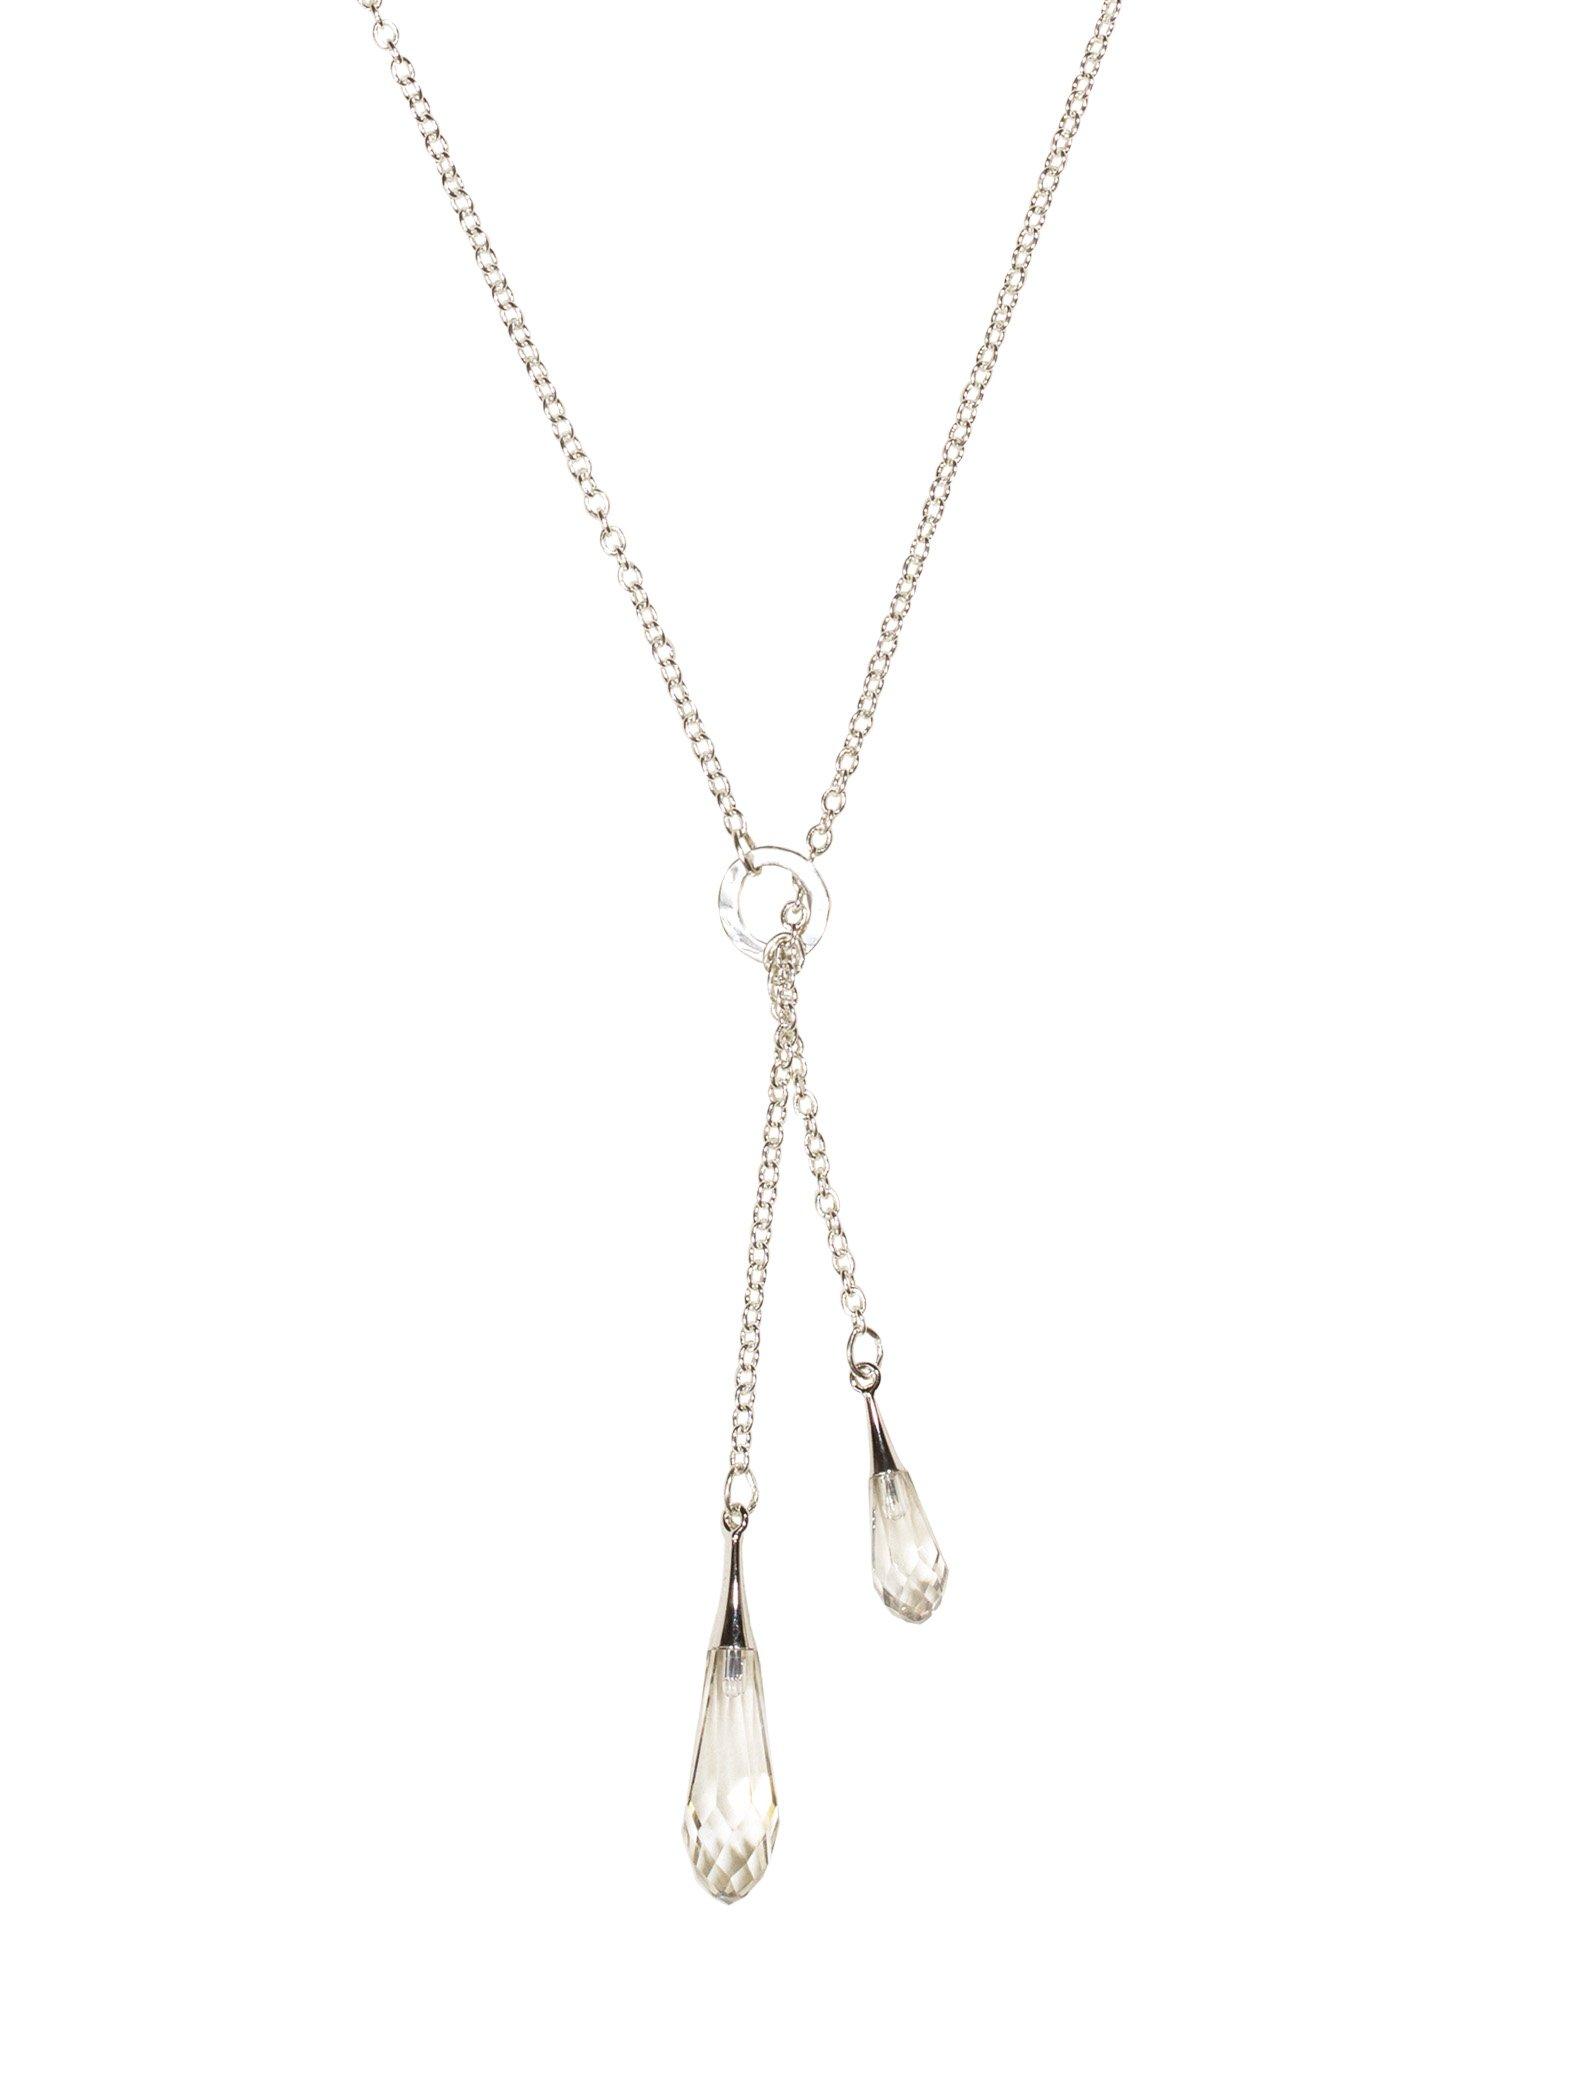 Holly Yashi Rain Drop Larait Necklace, Hypoallergenic Jewelry, Made in California (Grey/Silver)